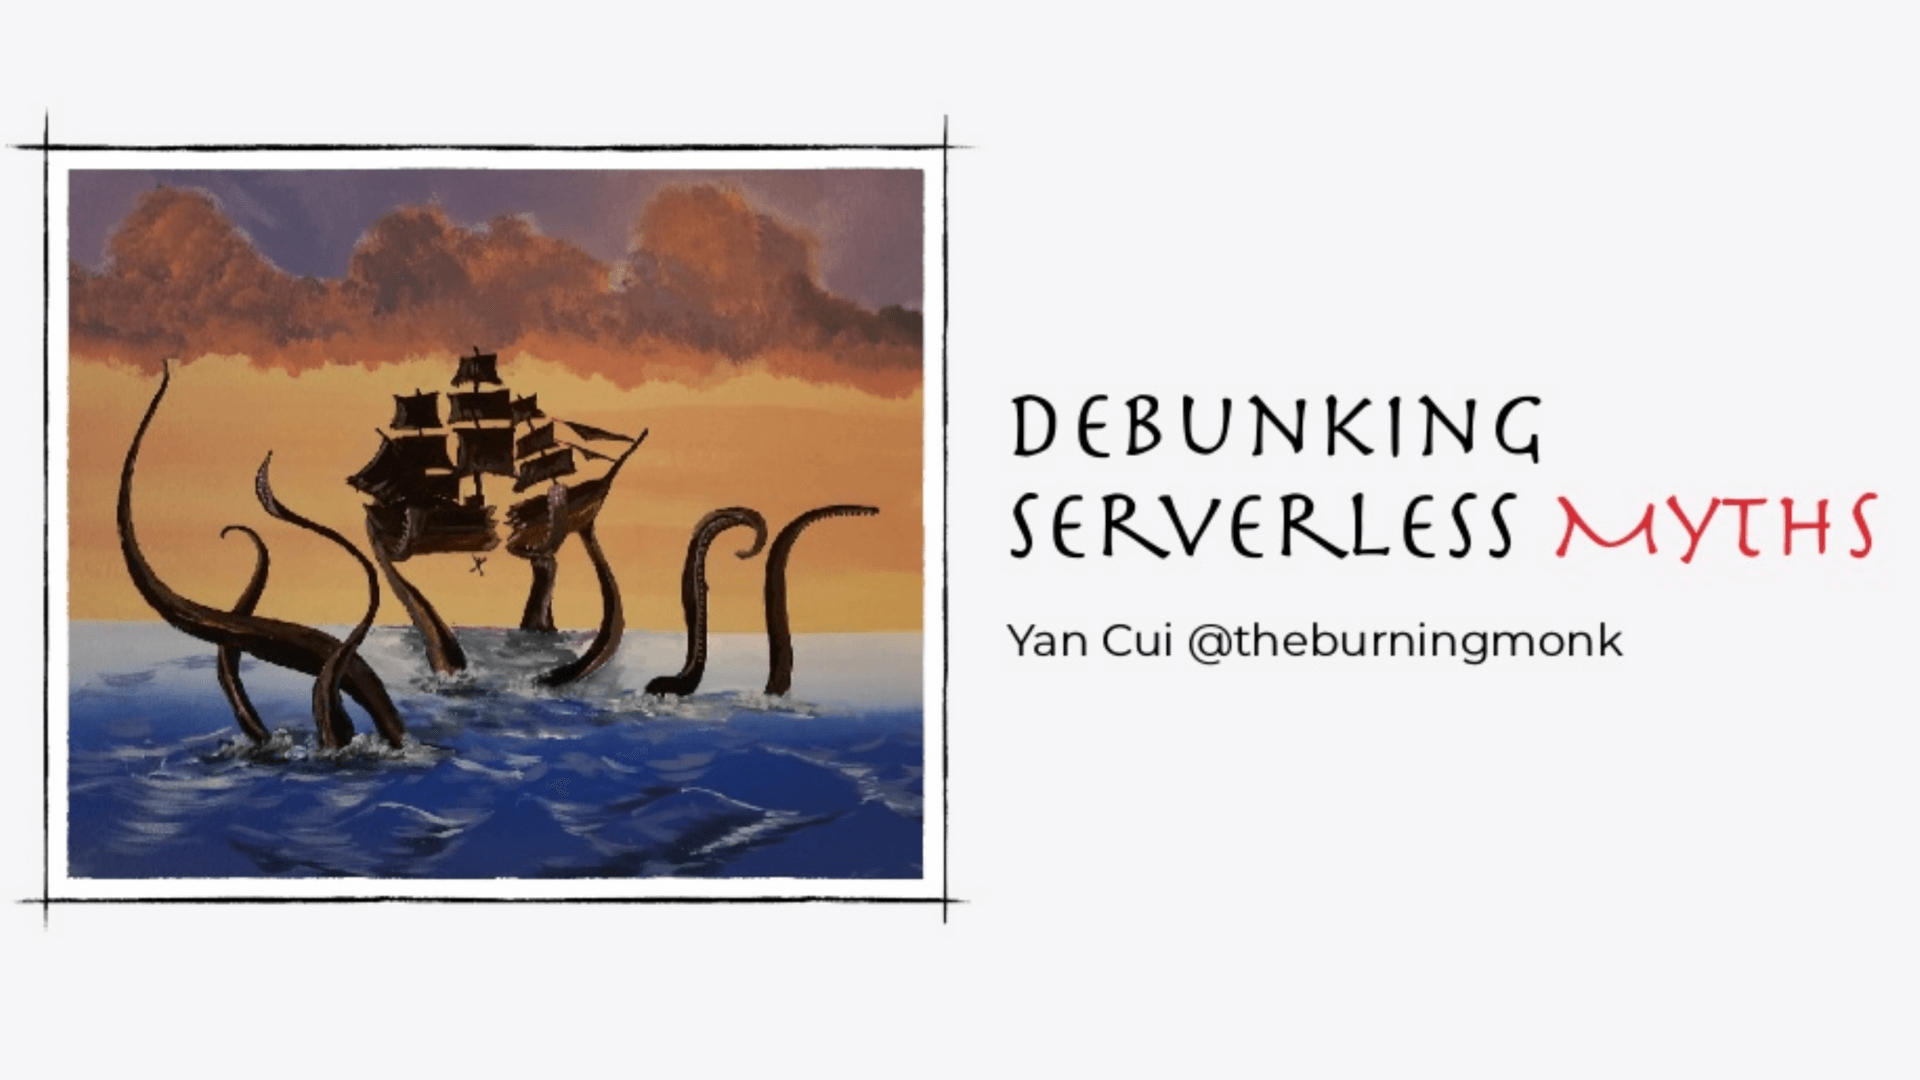 Yan Cui - ServerlessDays Hamburg